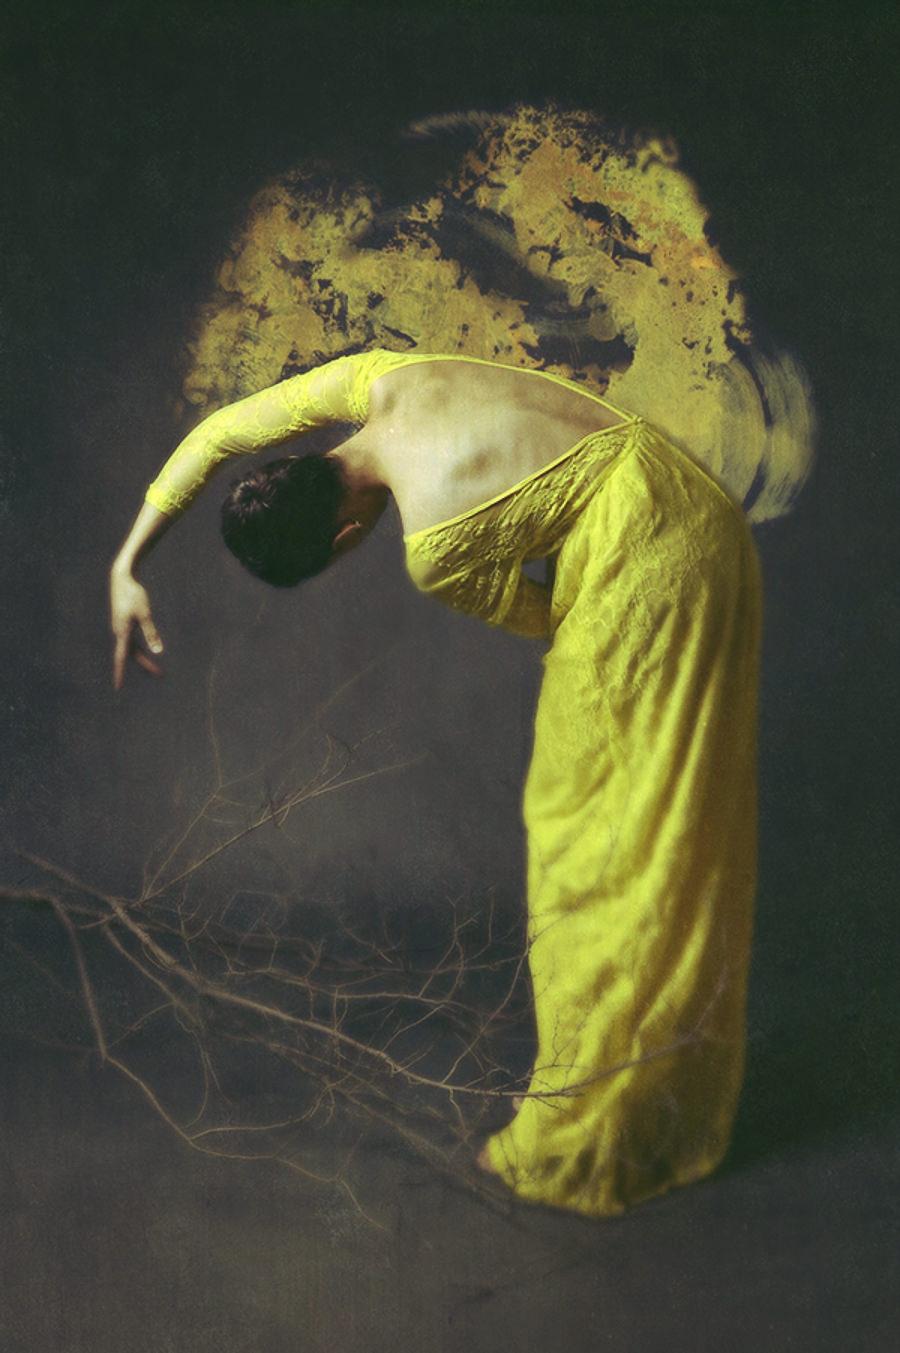 Of Desolate Amber by Josephine Cardin